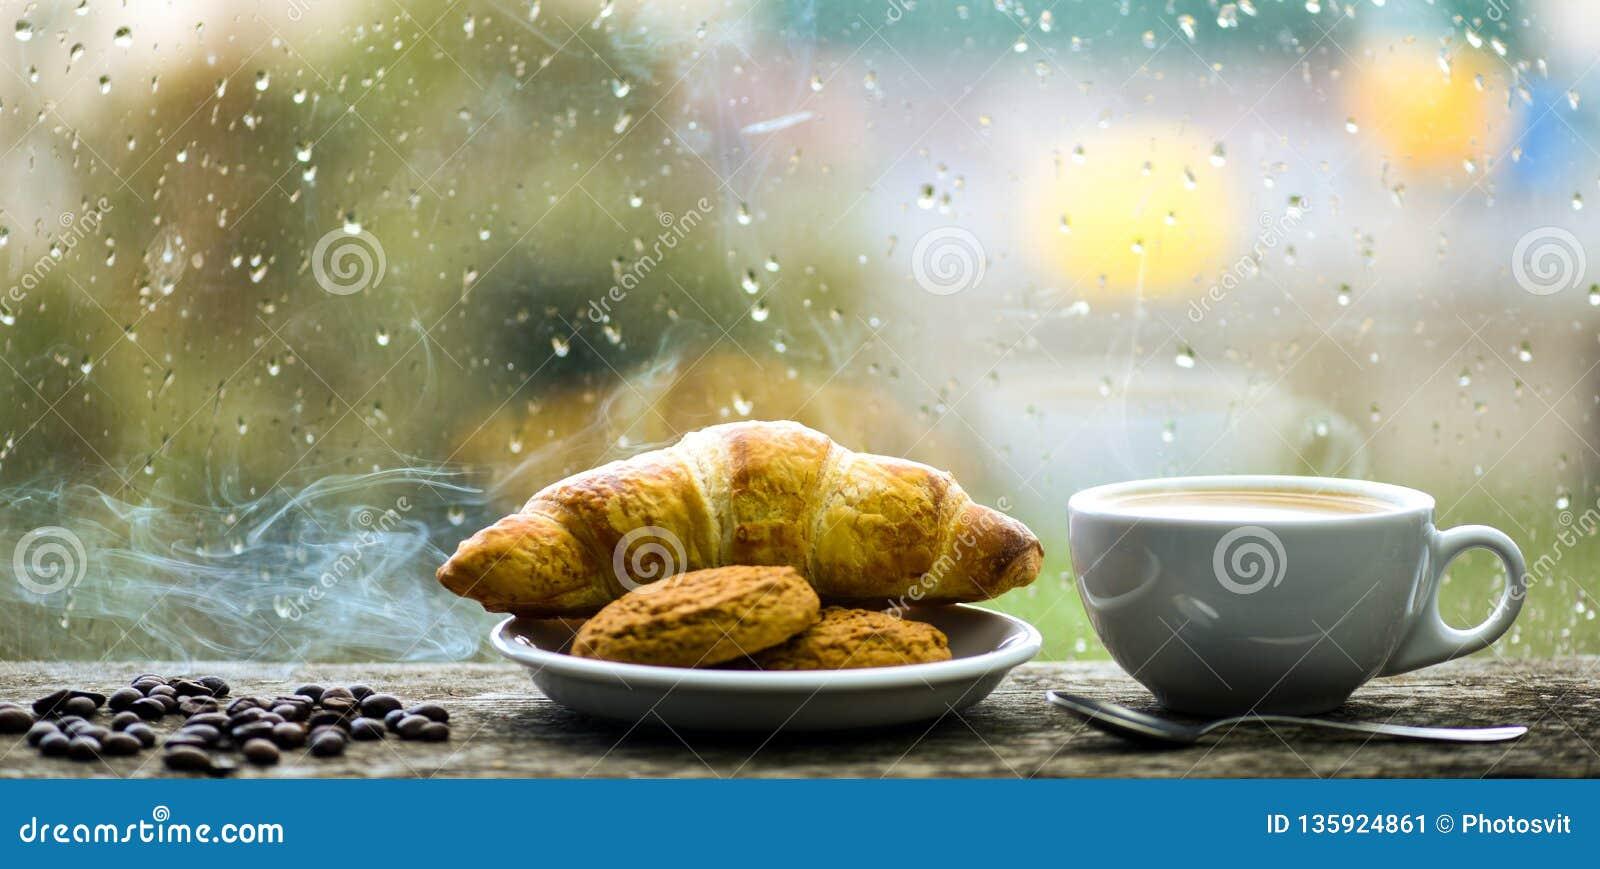 Fresh brewed coffee in white cup or mug on windowsill. Coffee drink with croissant dessert. Enjoying coffee on rainy day